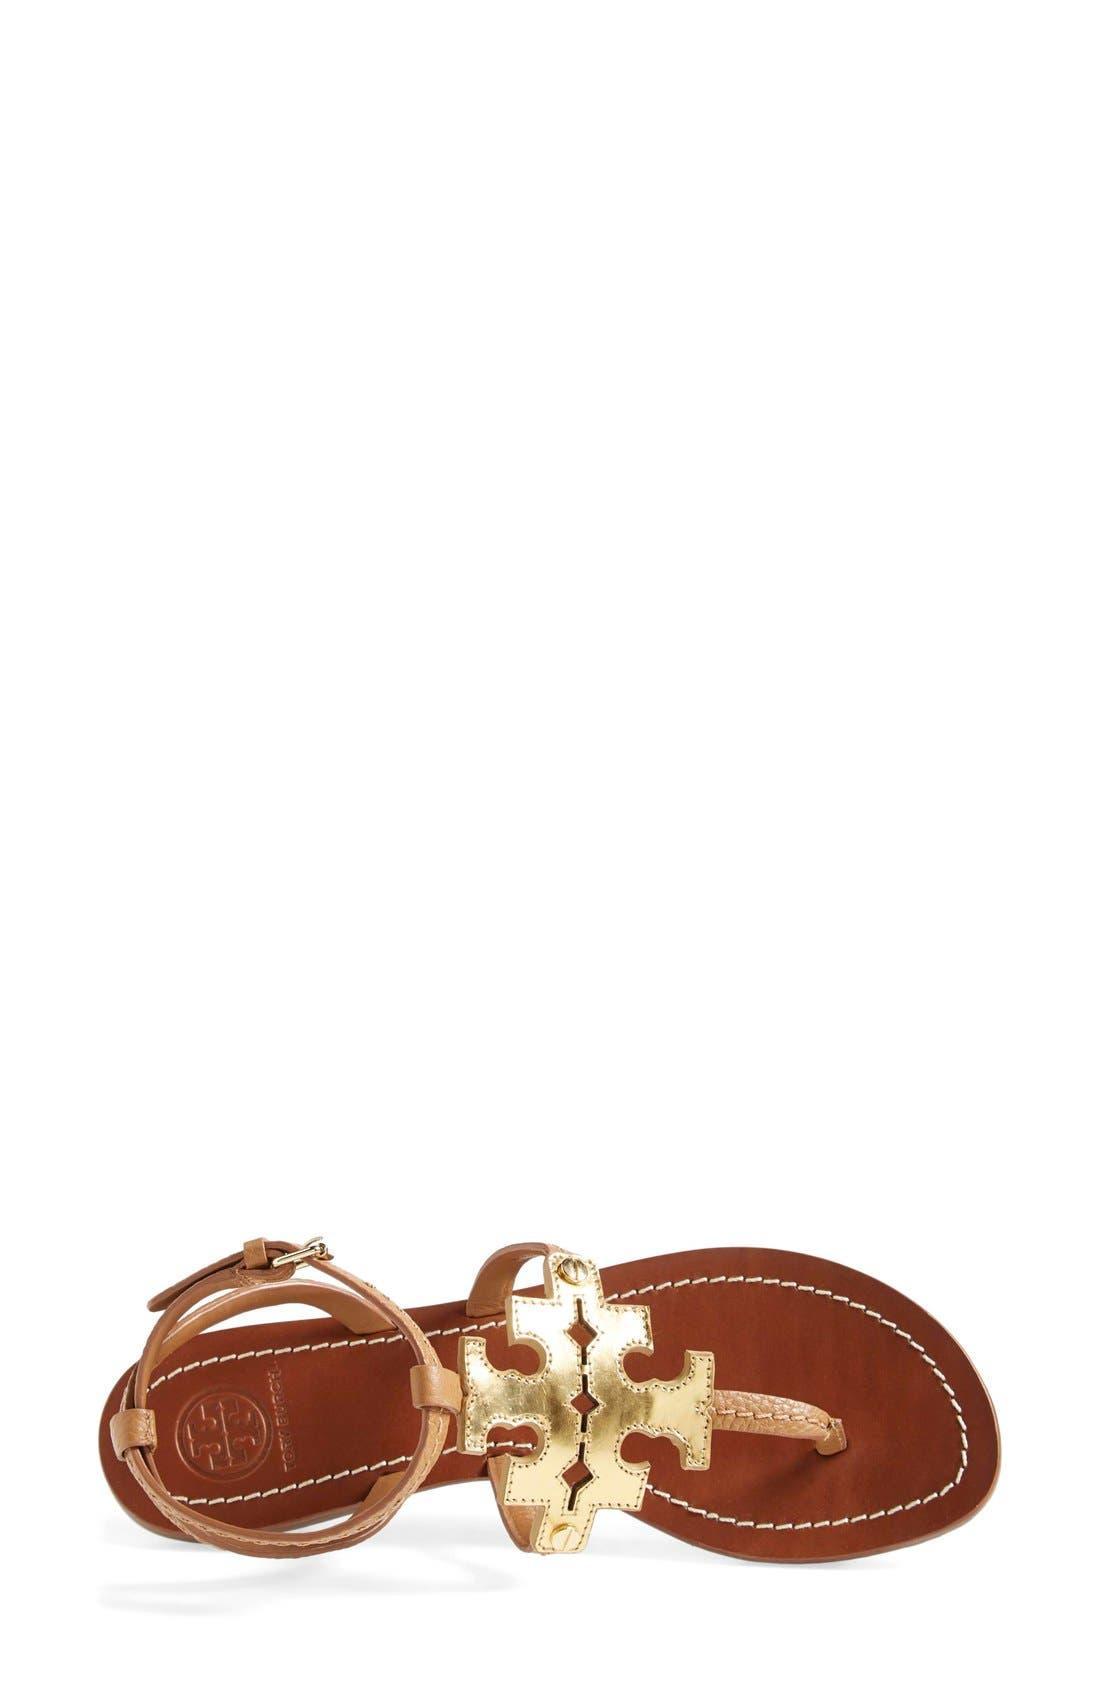 Alternate Image 3  - Tory Burch 'Chandler' Leather Sandal (Women)